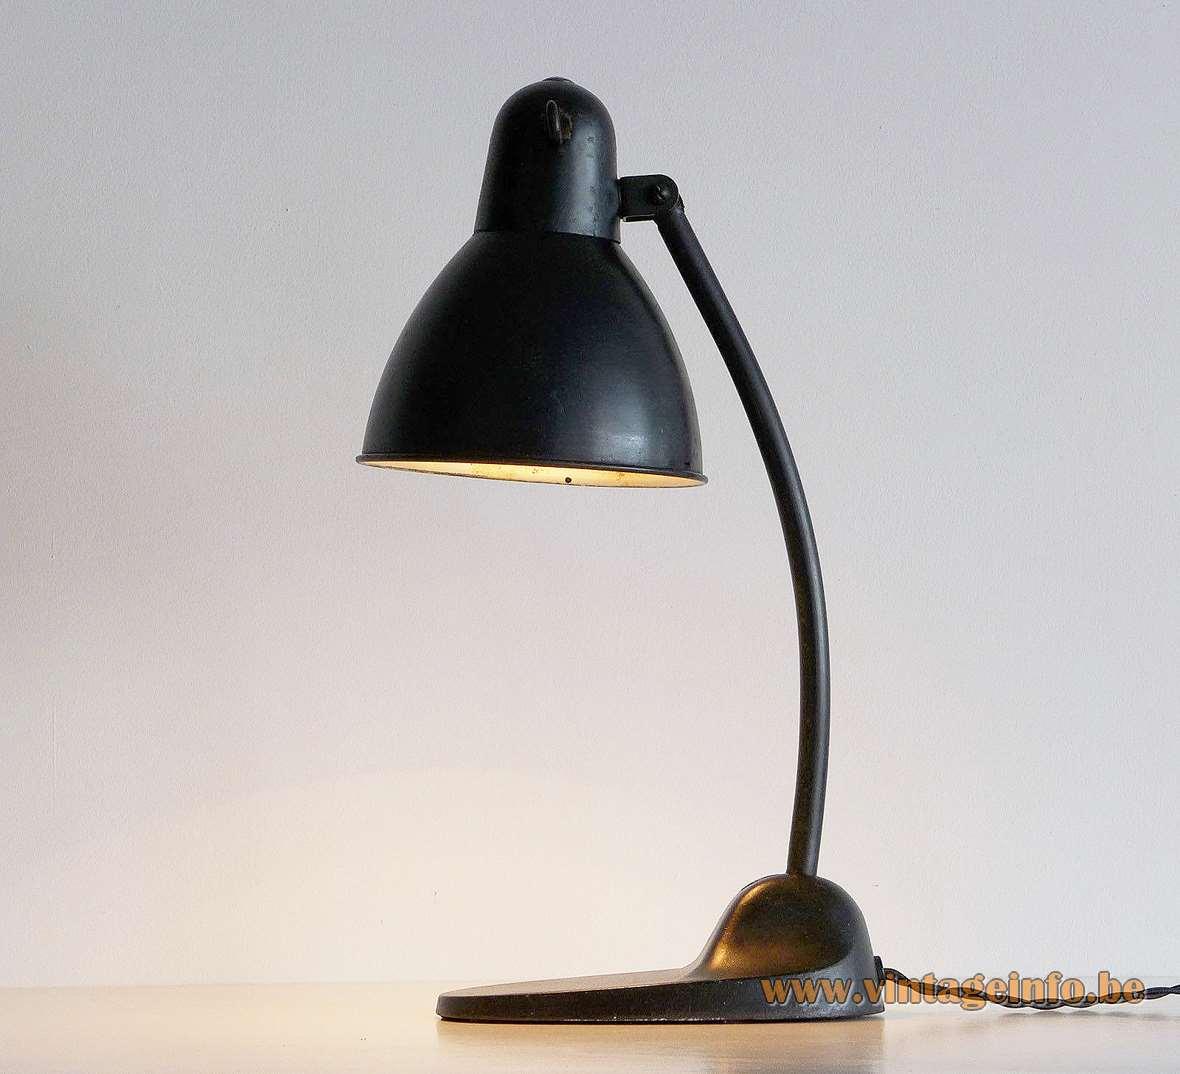 Siemens-Schuckertwerke L299 Desk Lamp